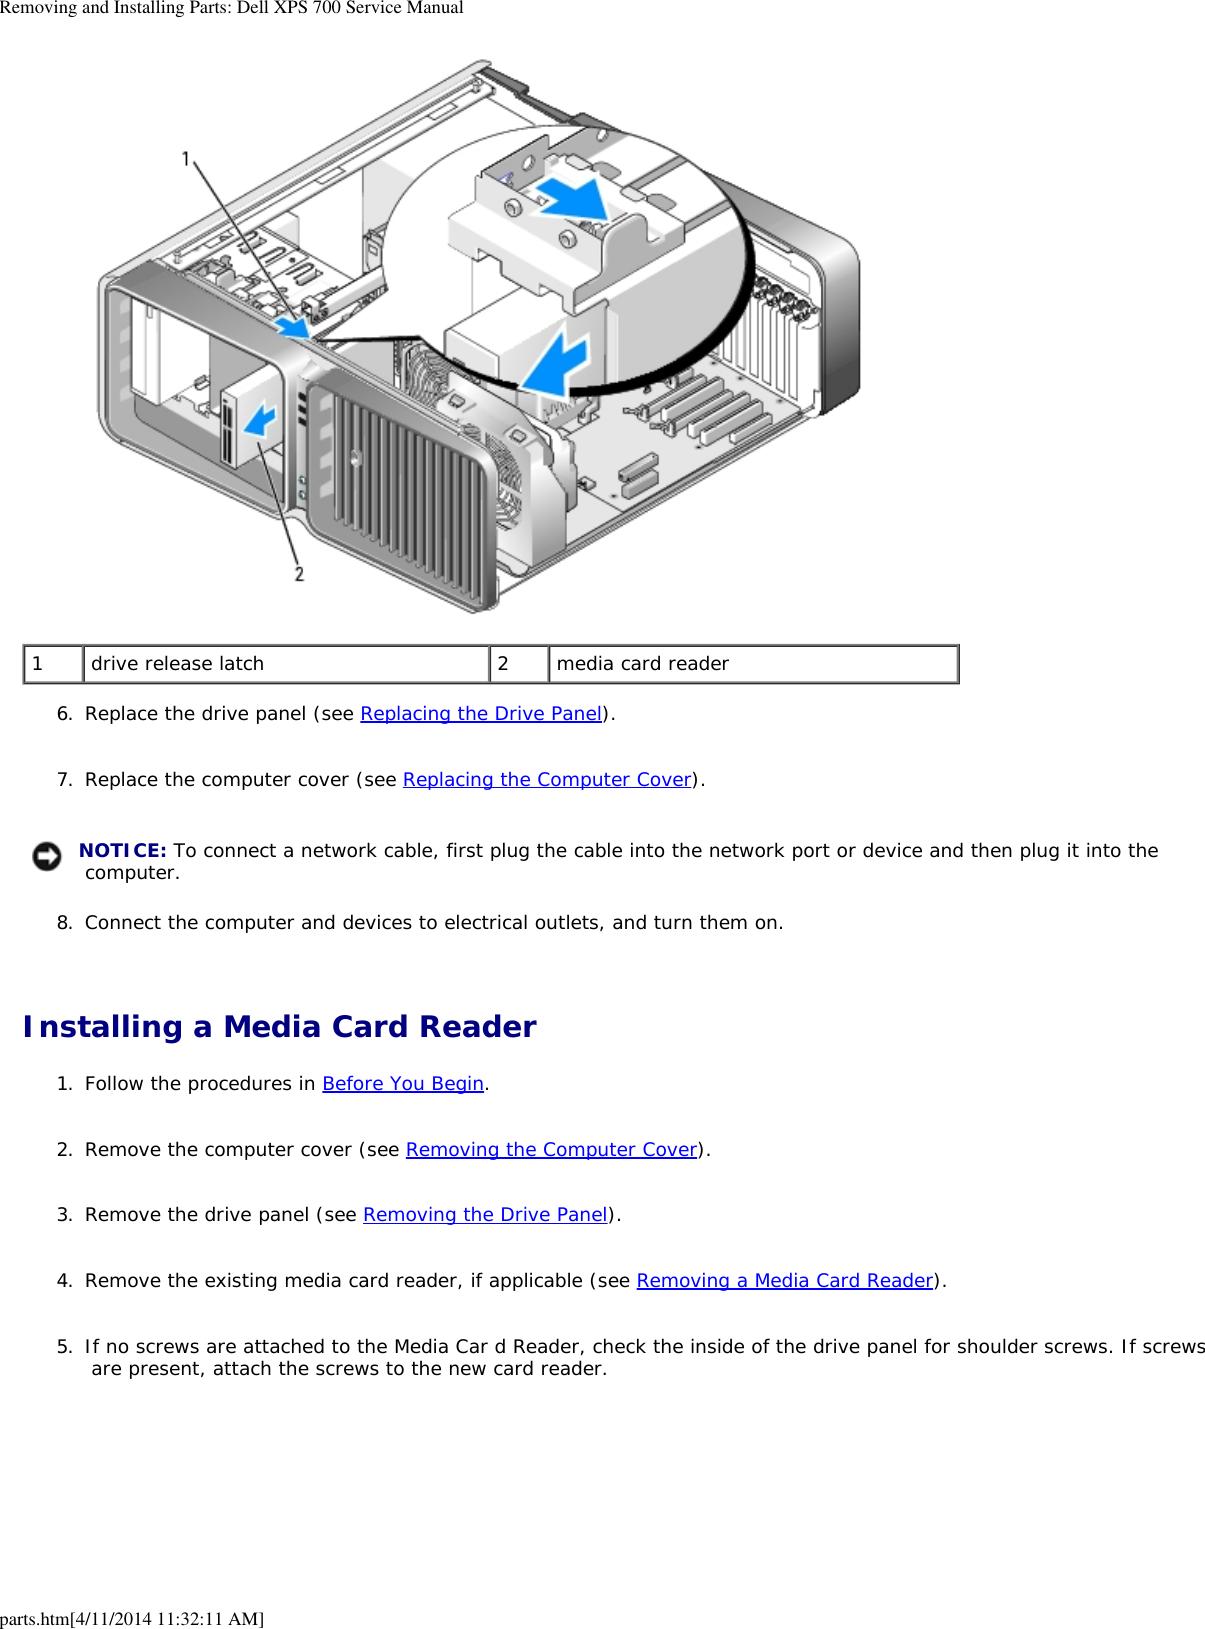 Dell Xps 710 Service Manual